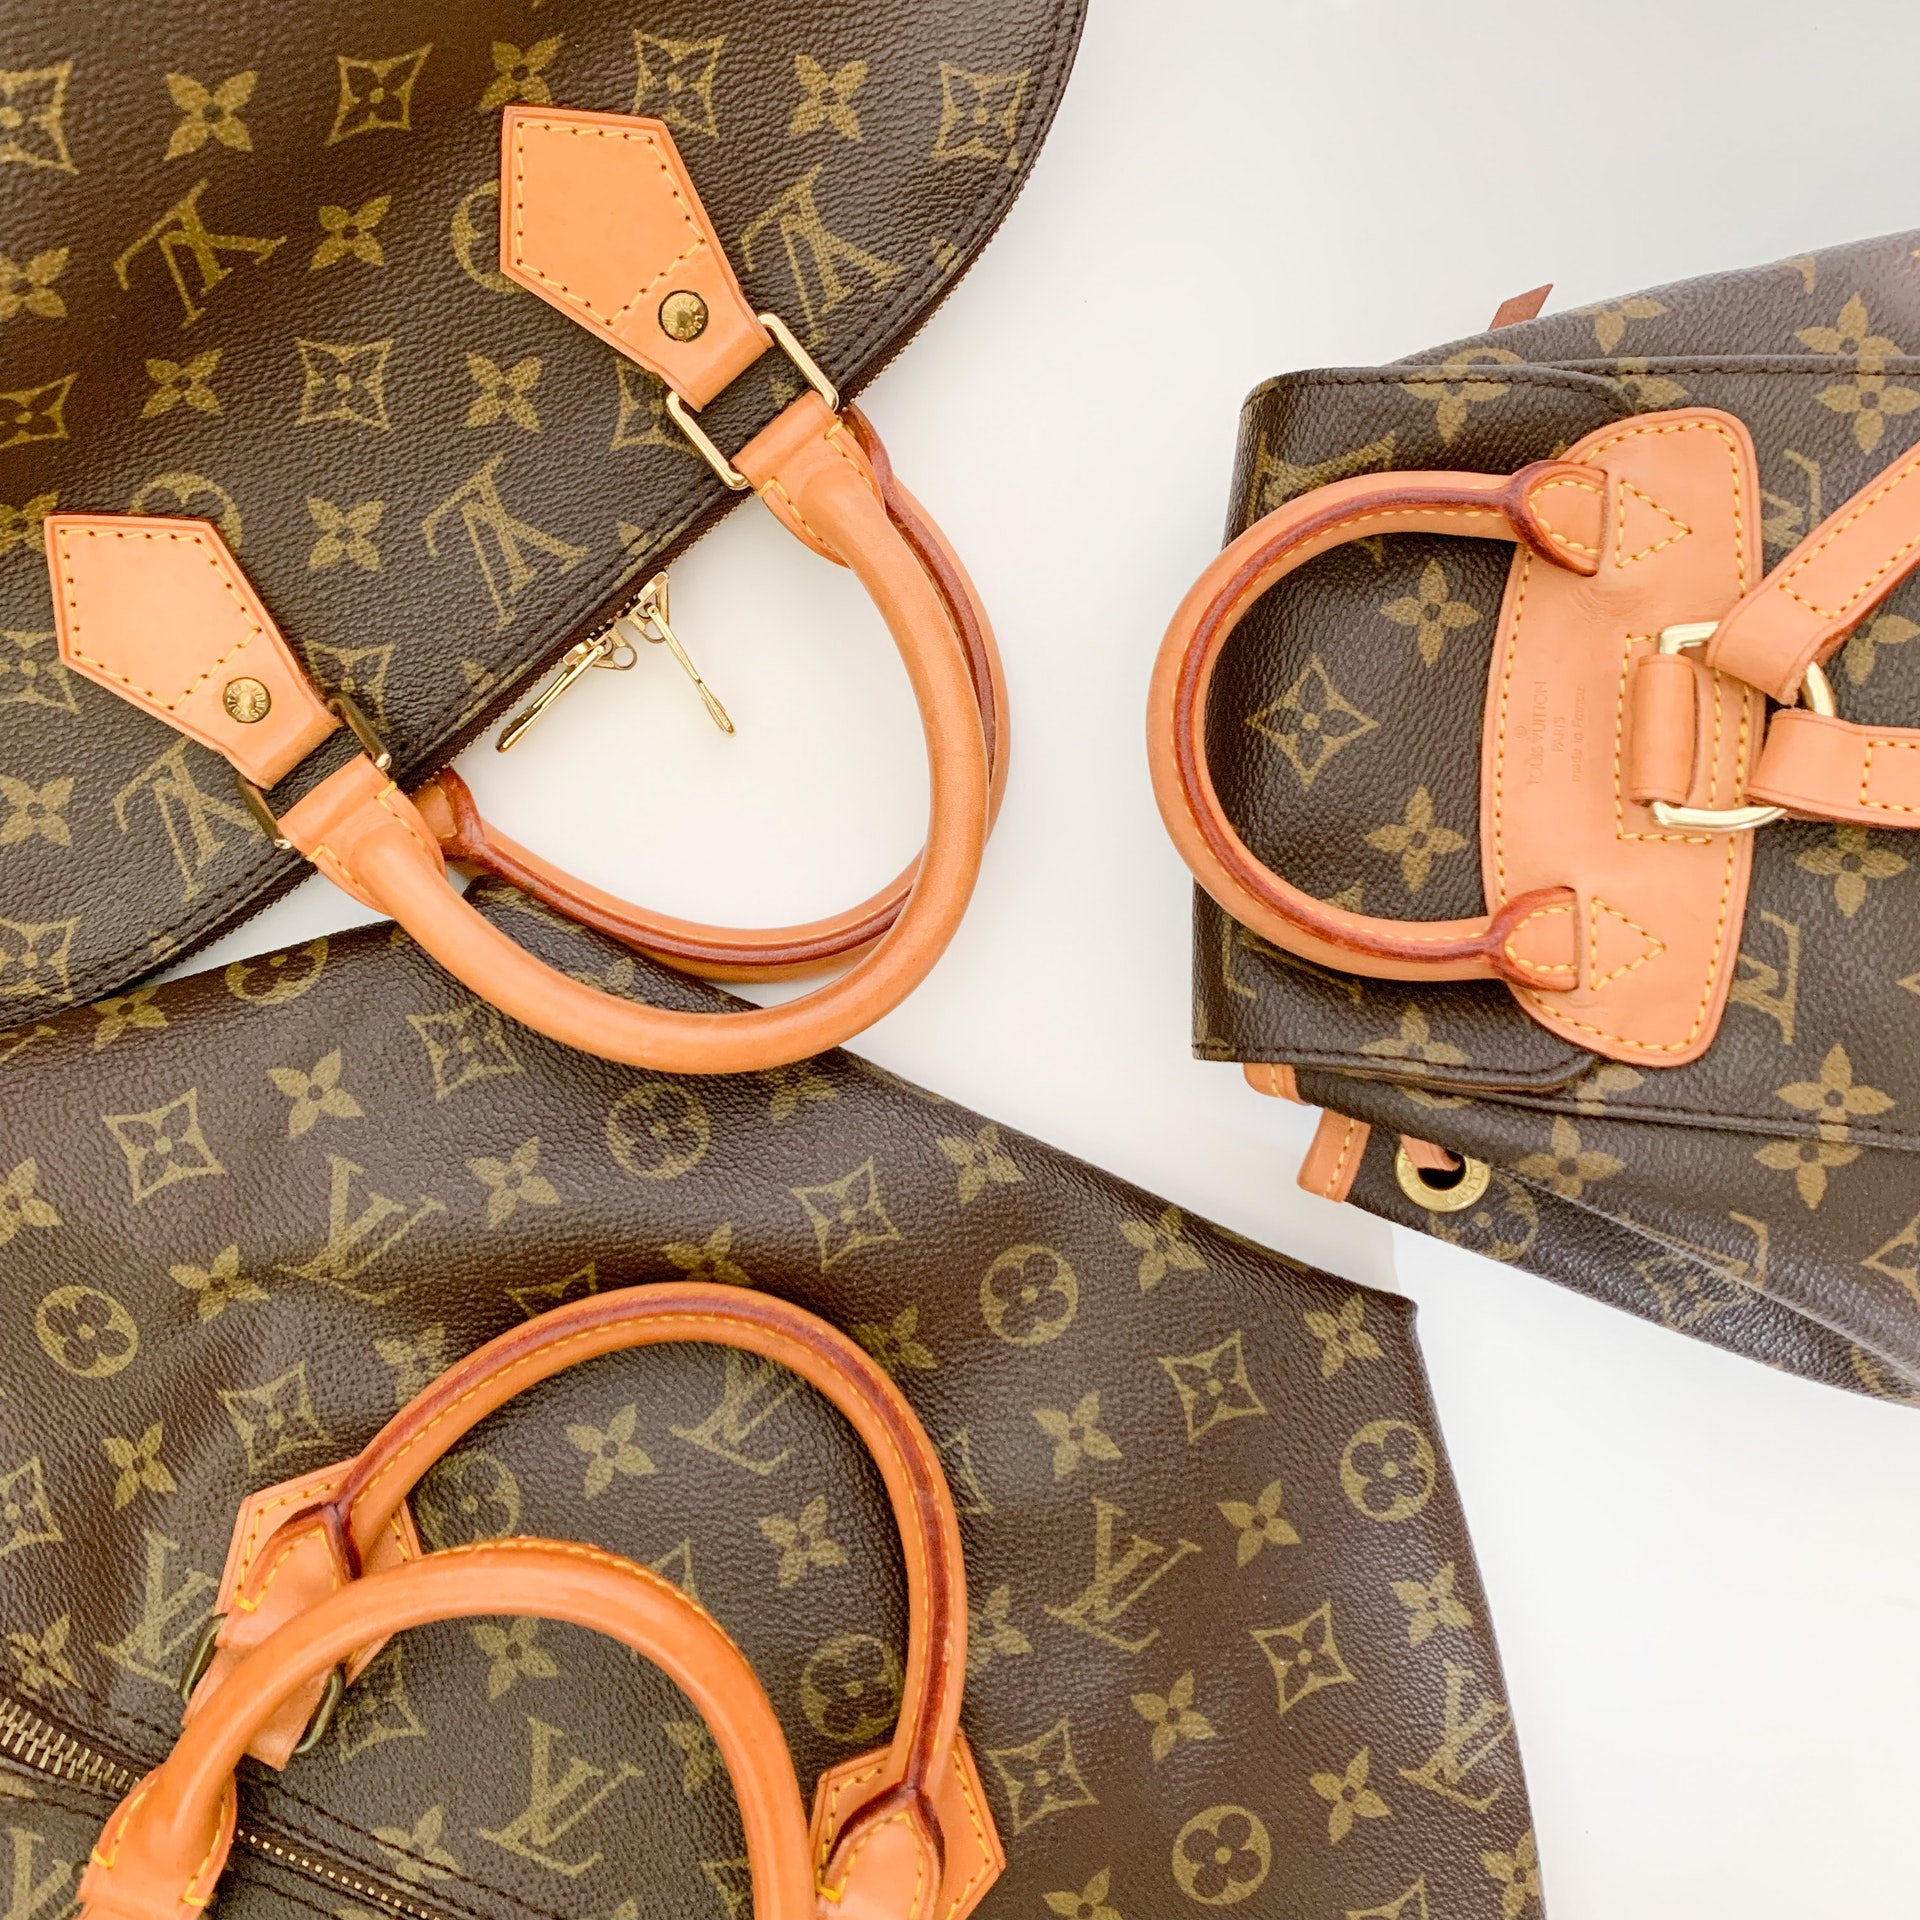 Louis Vuitton Gepäck